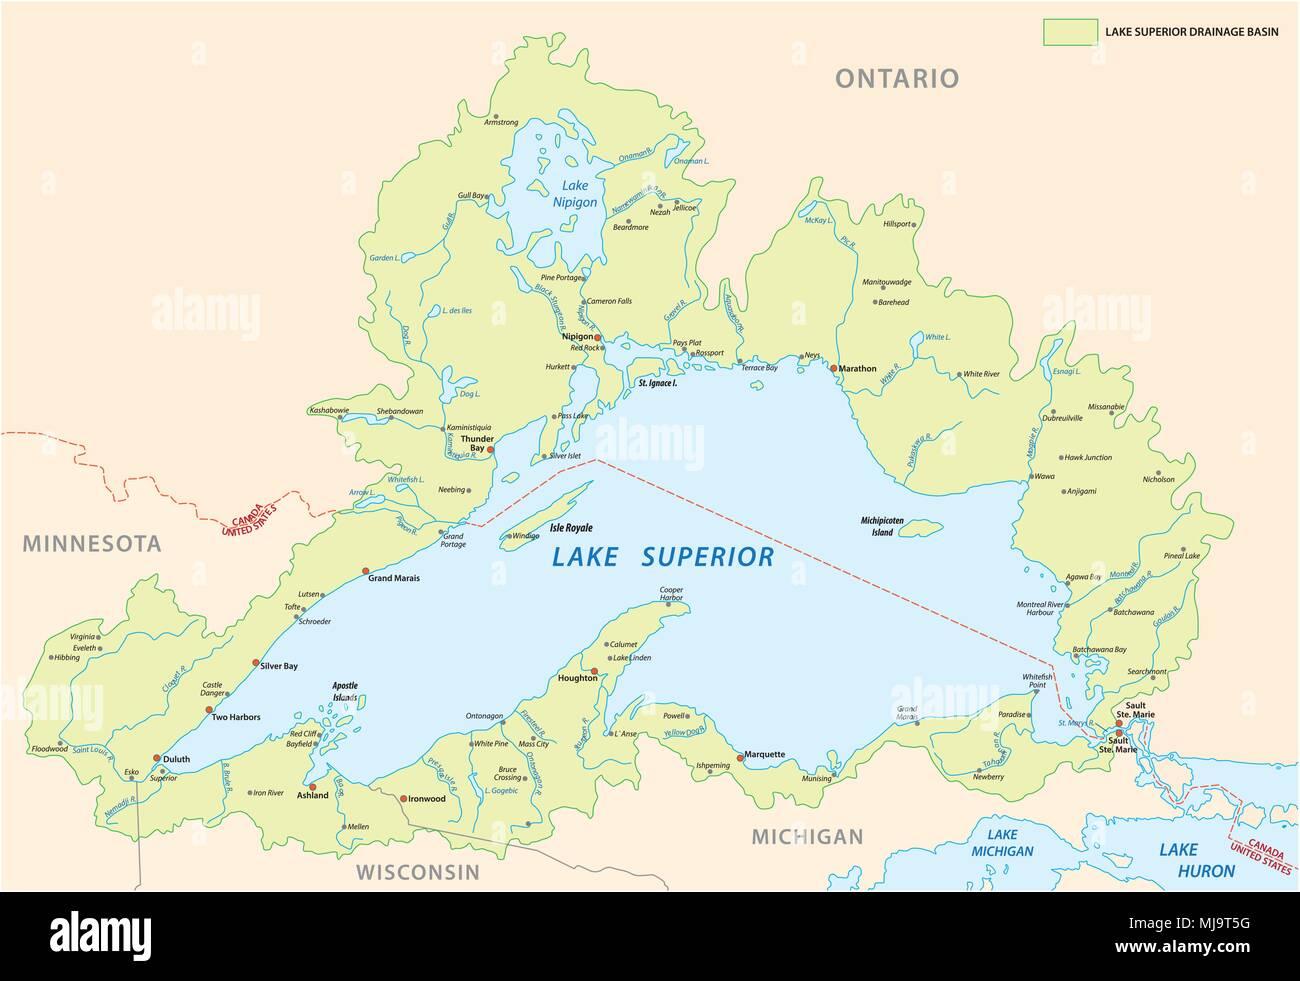 Map Of Lake Ontario Stock Photos & Map Of Lake Ontario Stock Images ...